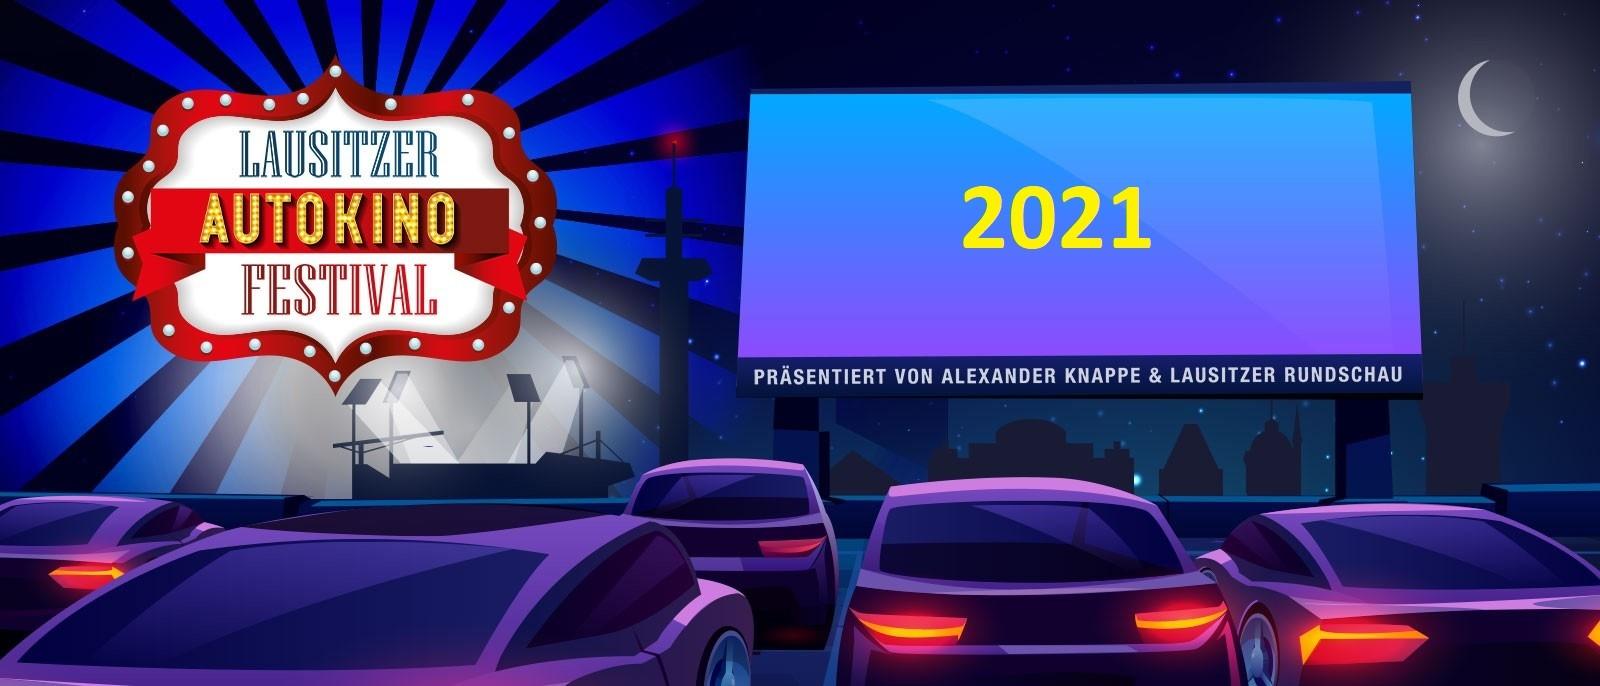 Lausitzer Autokinofestival 2021